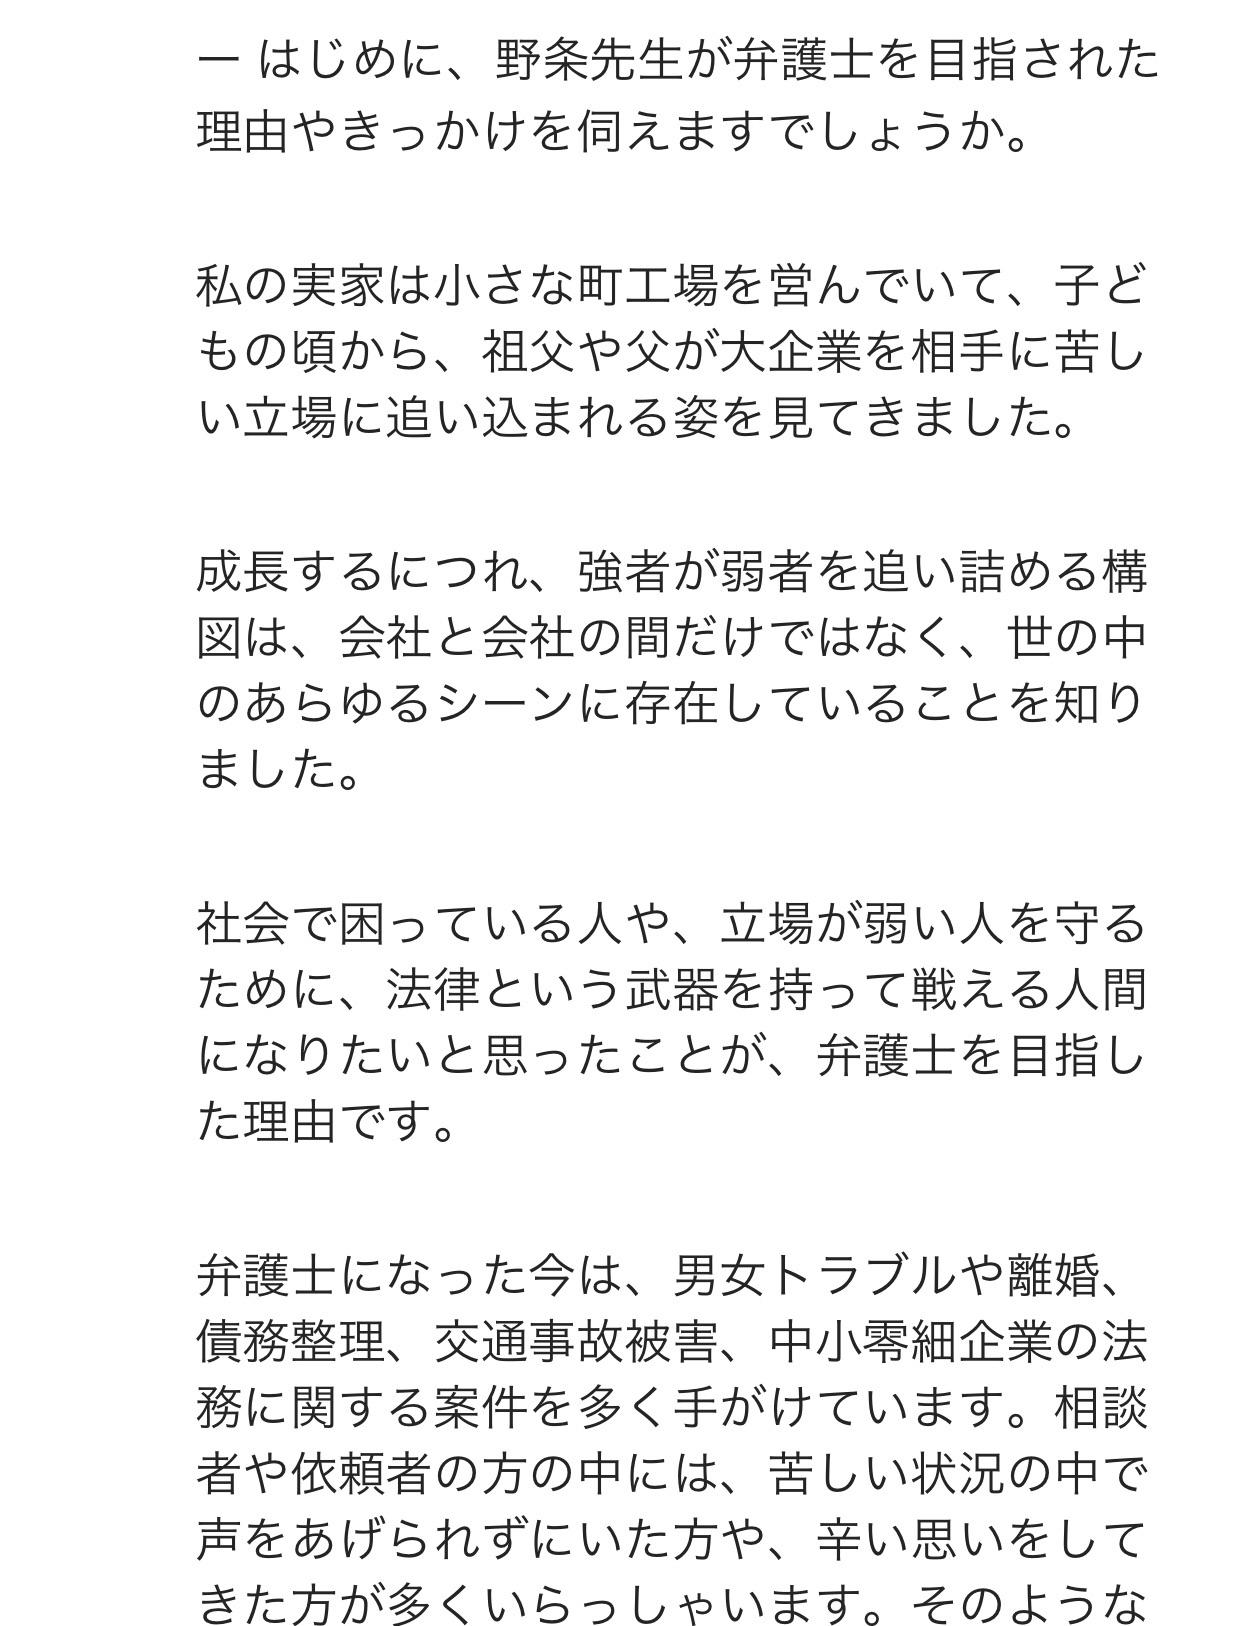 f:id:kagaribi-kotsujiko:20210109002556j:image